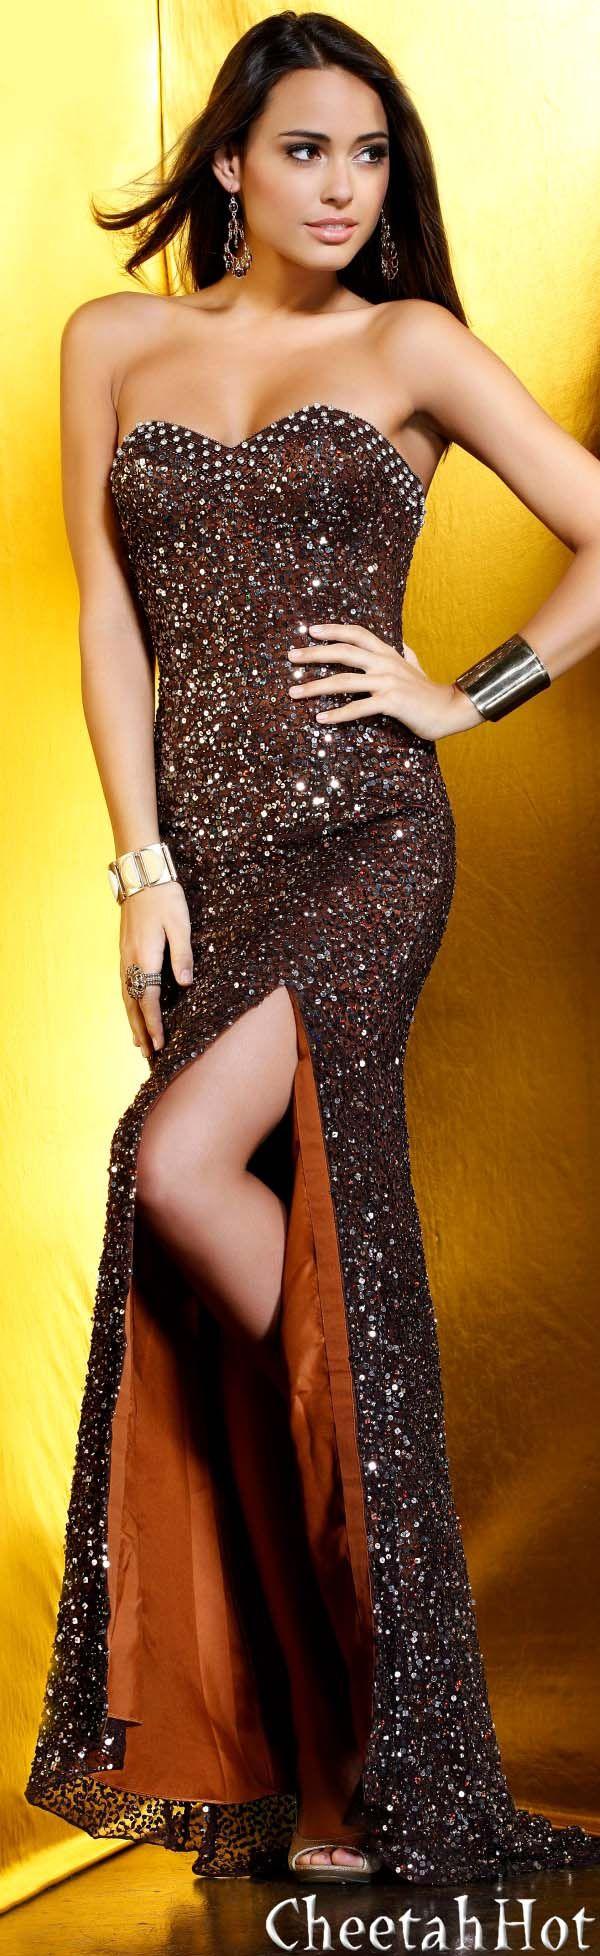 SHAIL K - Strapless Gown Style Fashion Dress